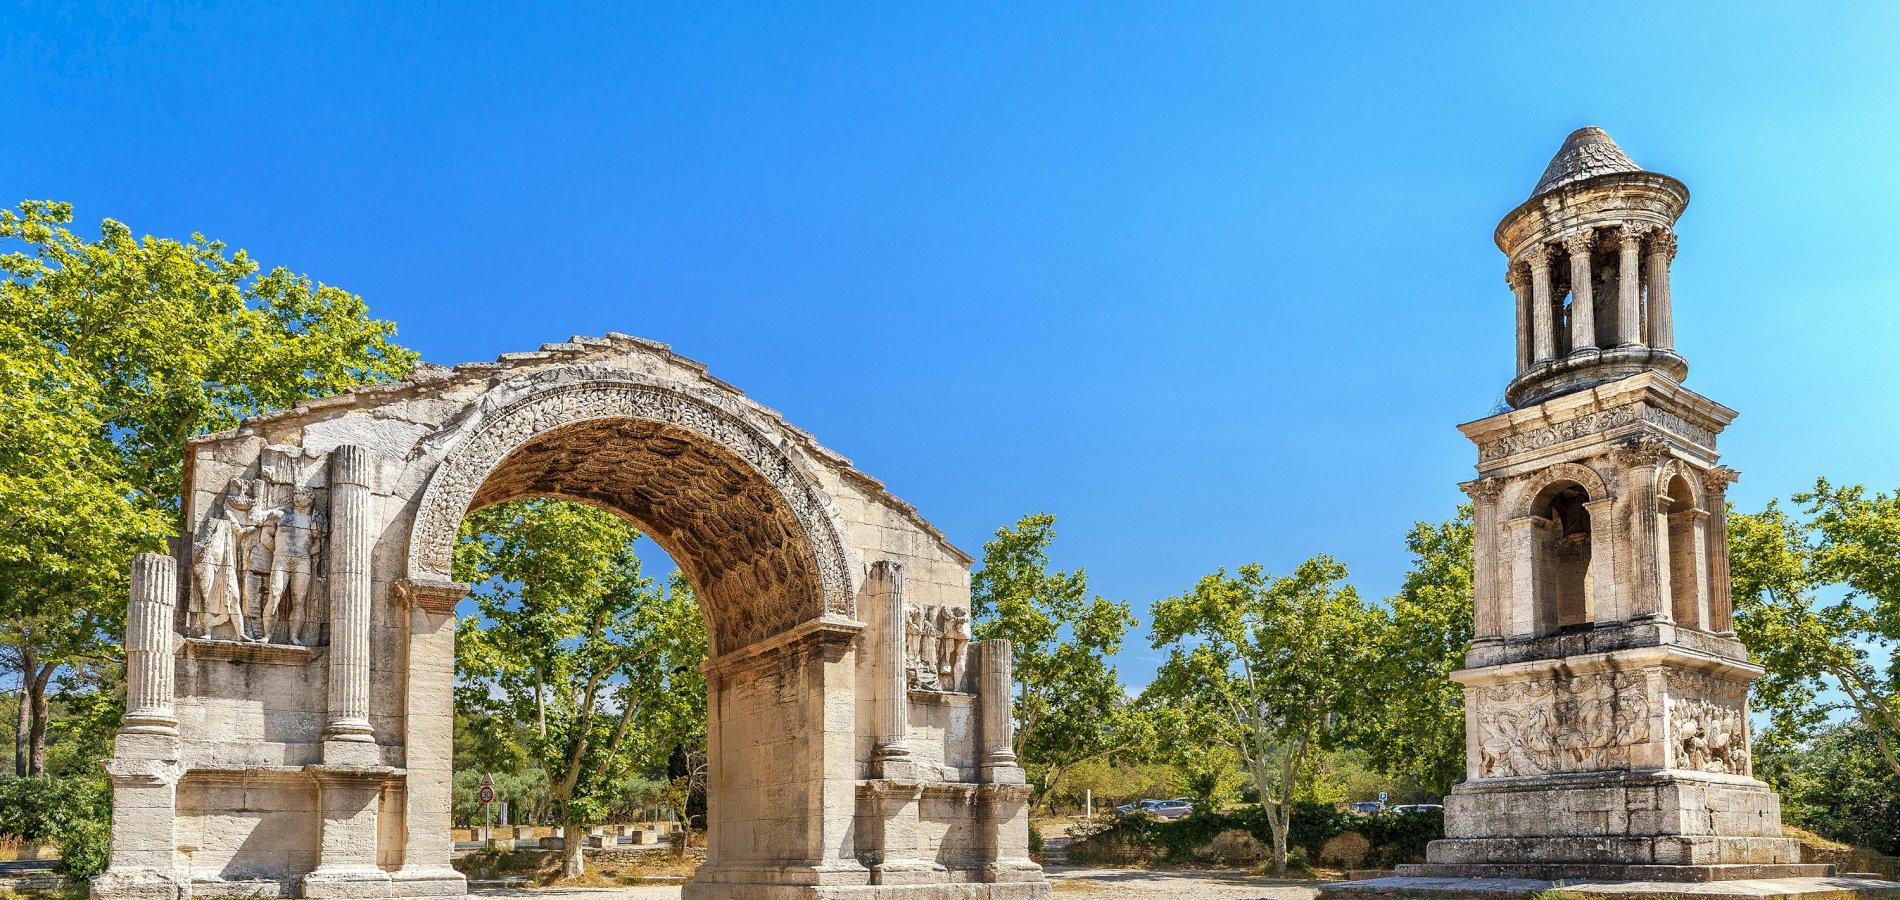 Ophorus Tours - Arles, St Rémy & Les Baux villages Private Day Trip from Marseille